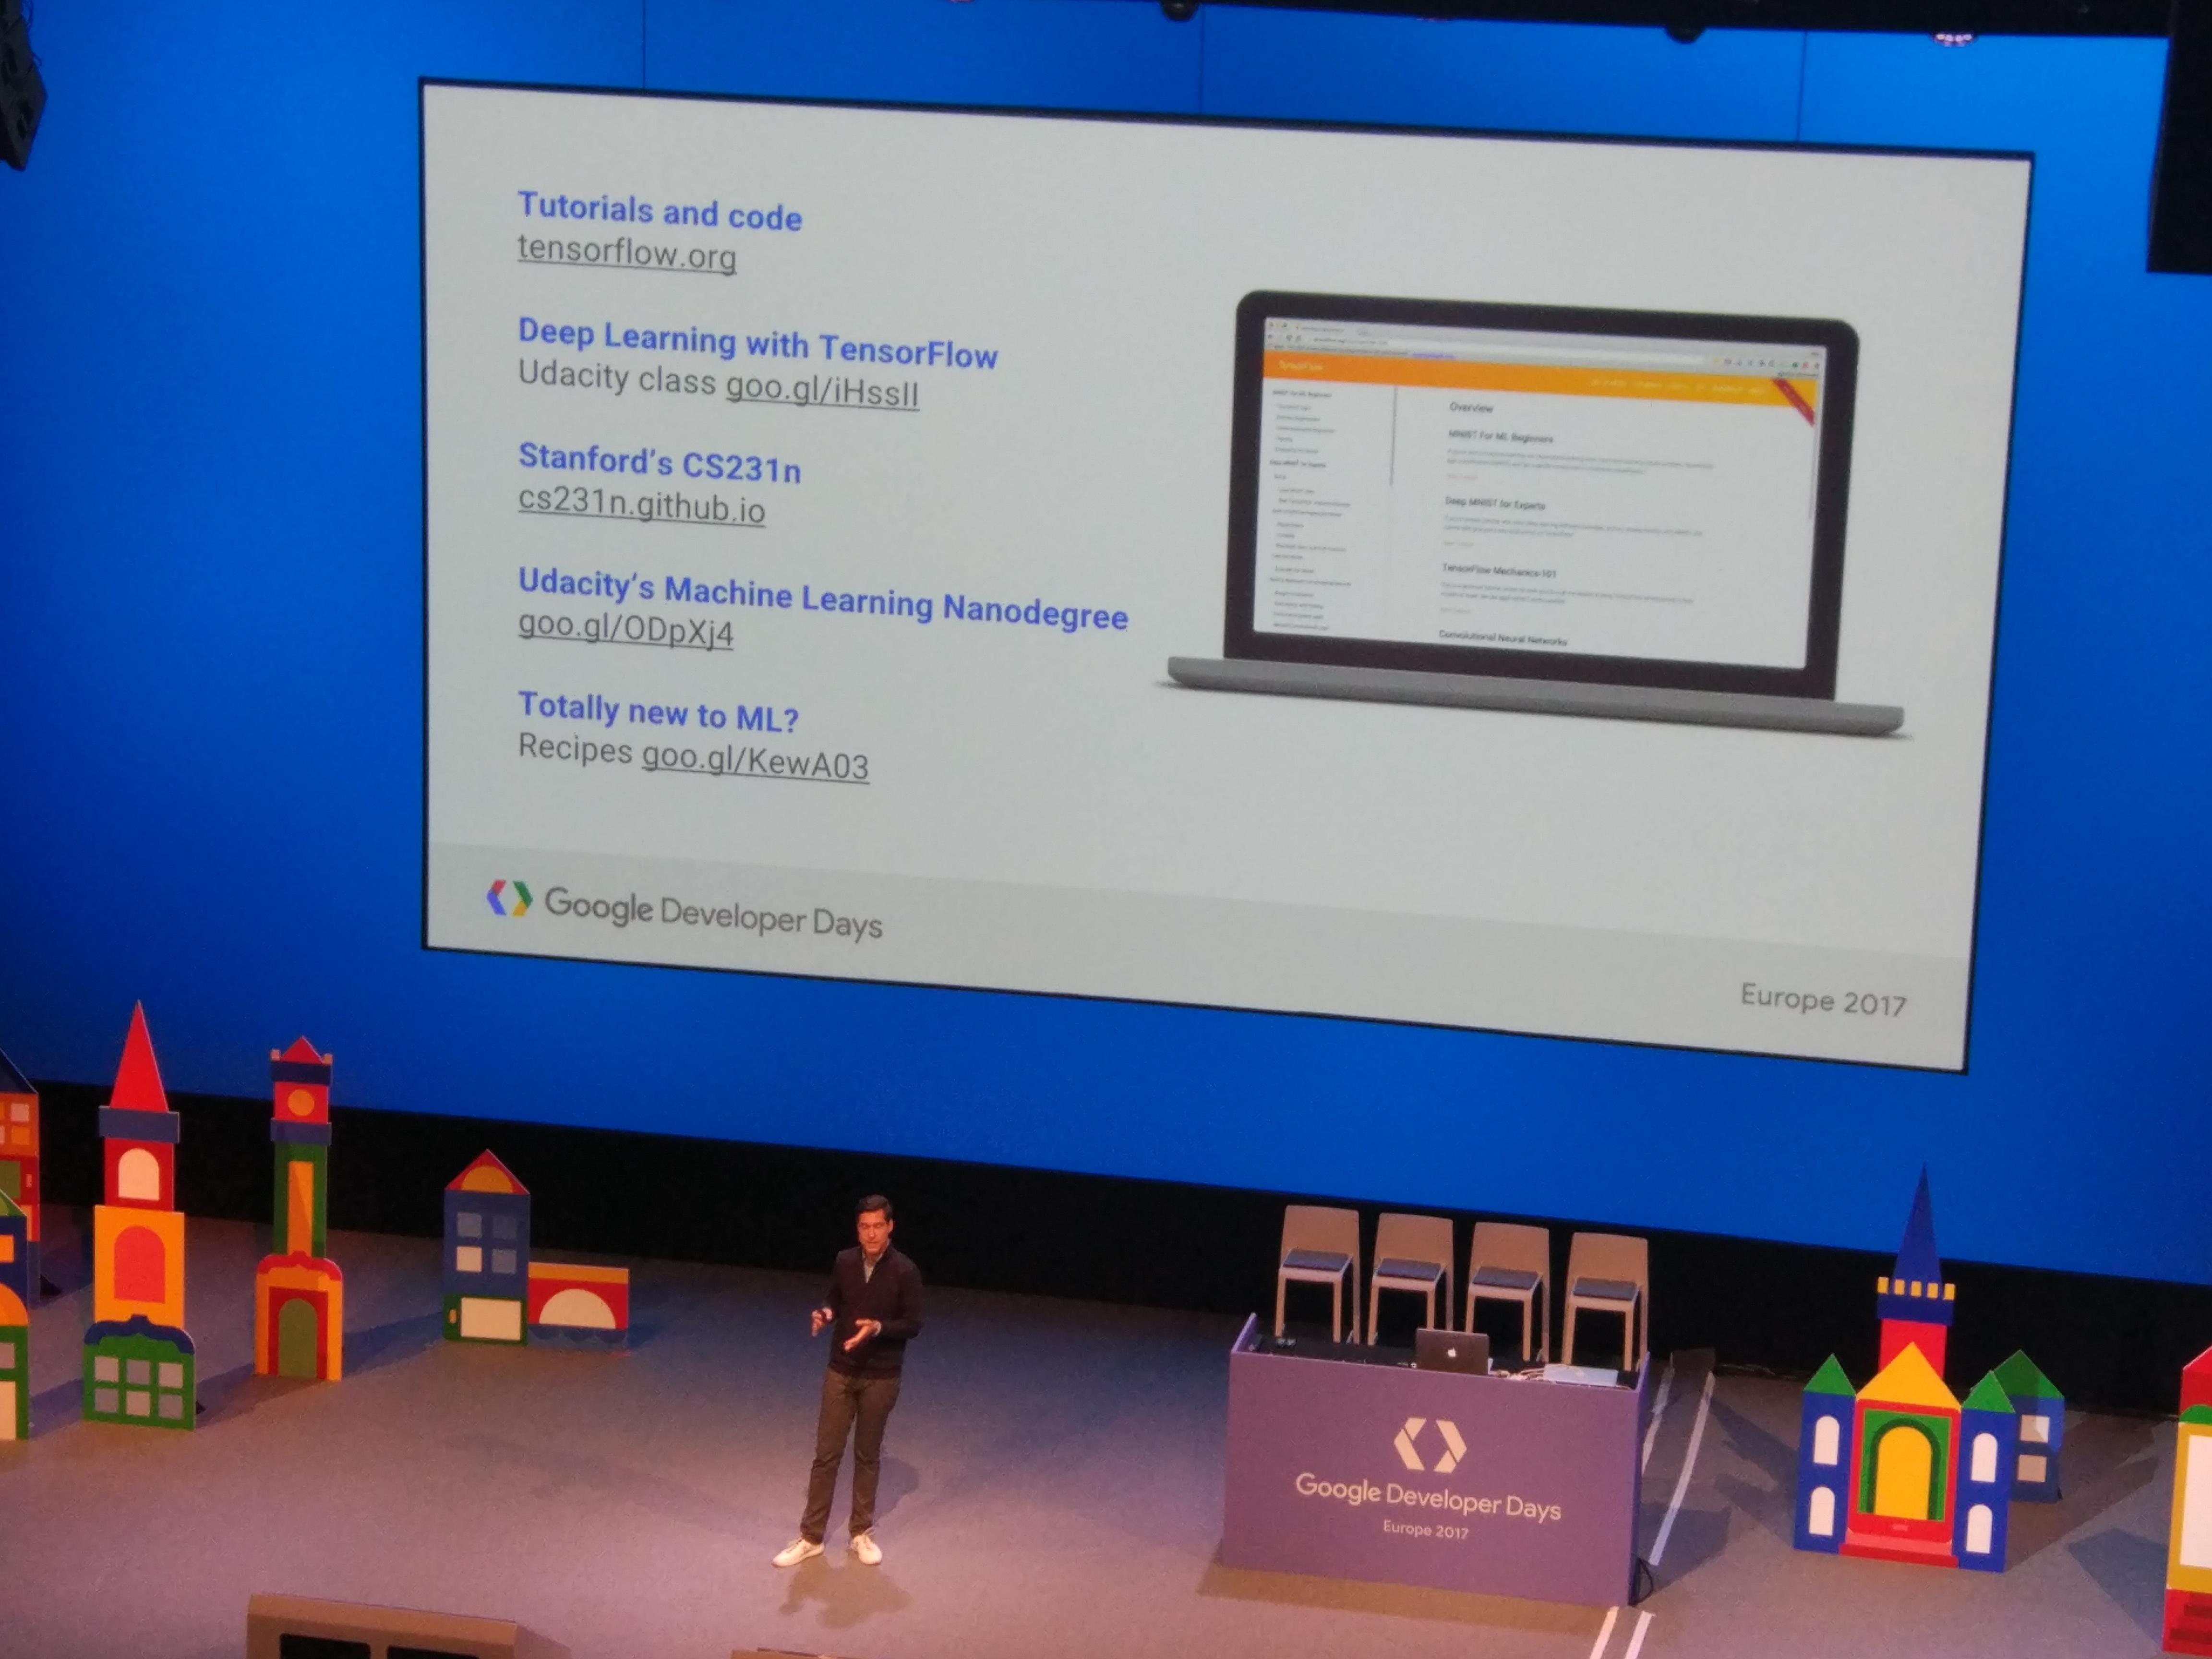 Webové technológie, machine learning či augmented reality: ako bolo na Google Developer Days v Krakowe? 3